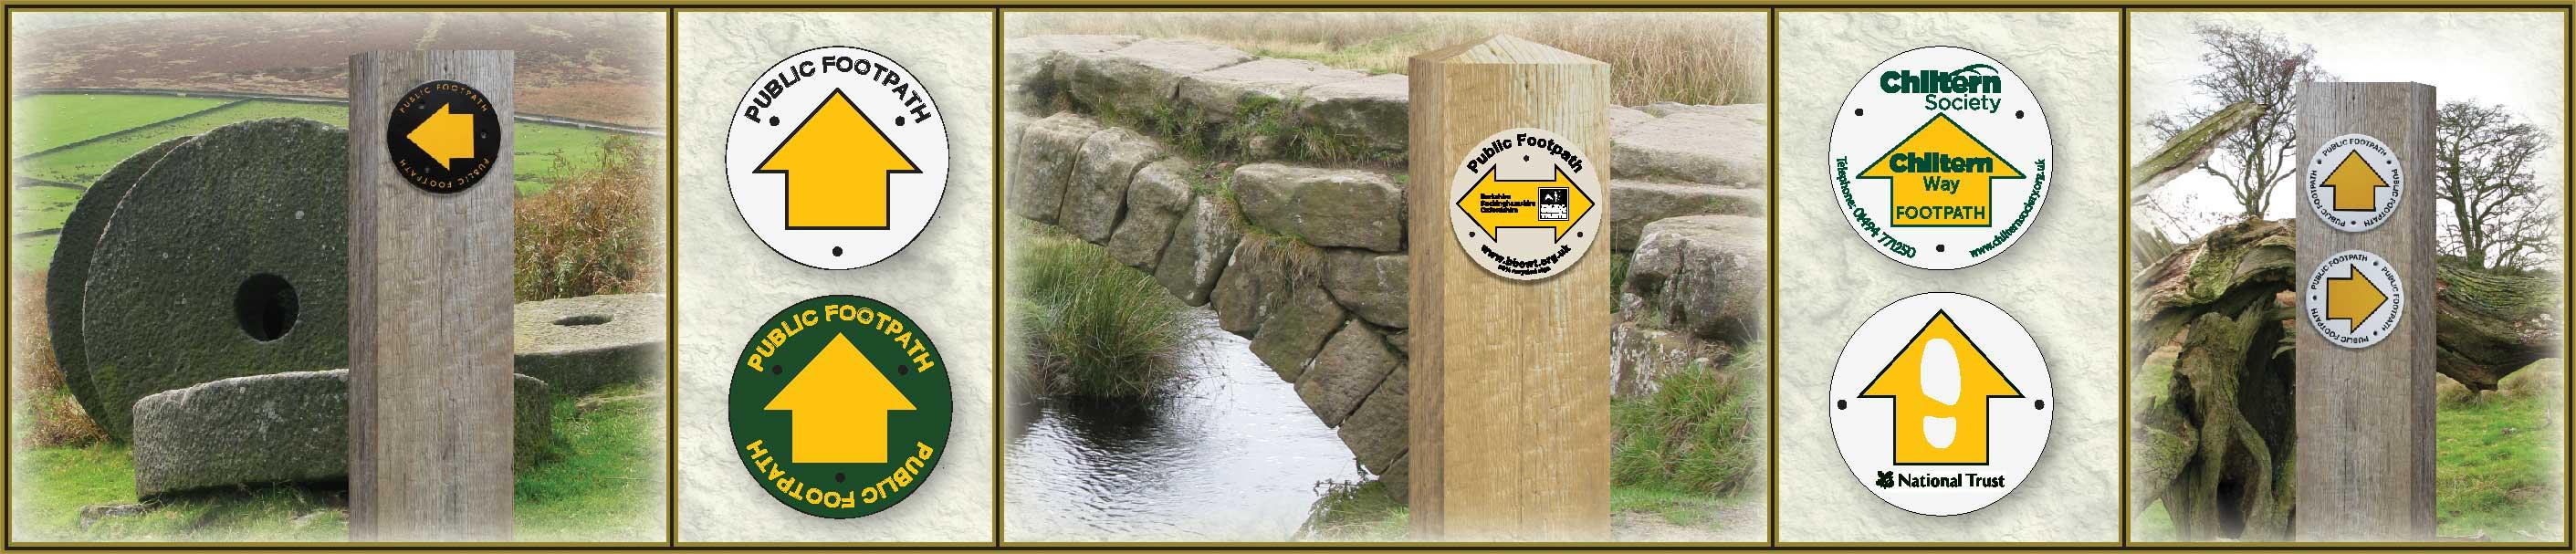 public footpath waymarker signs